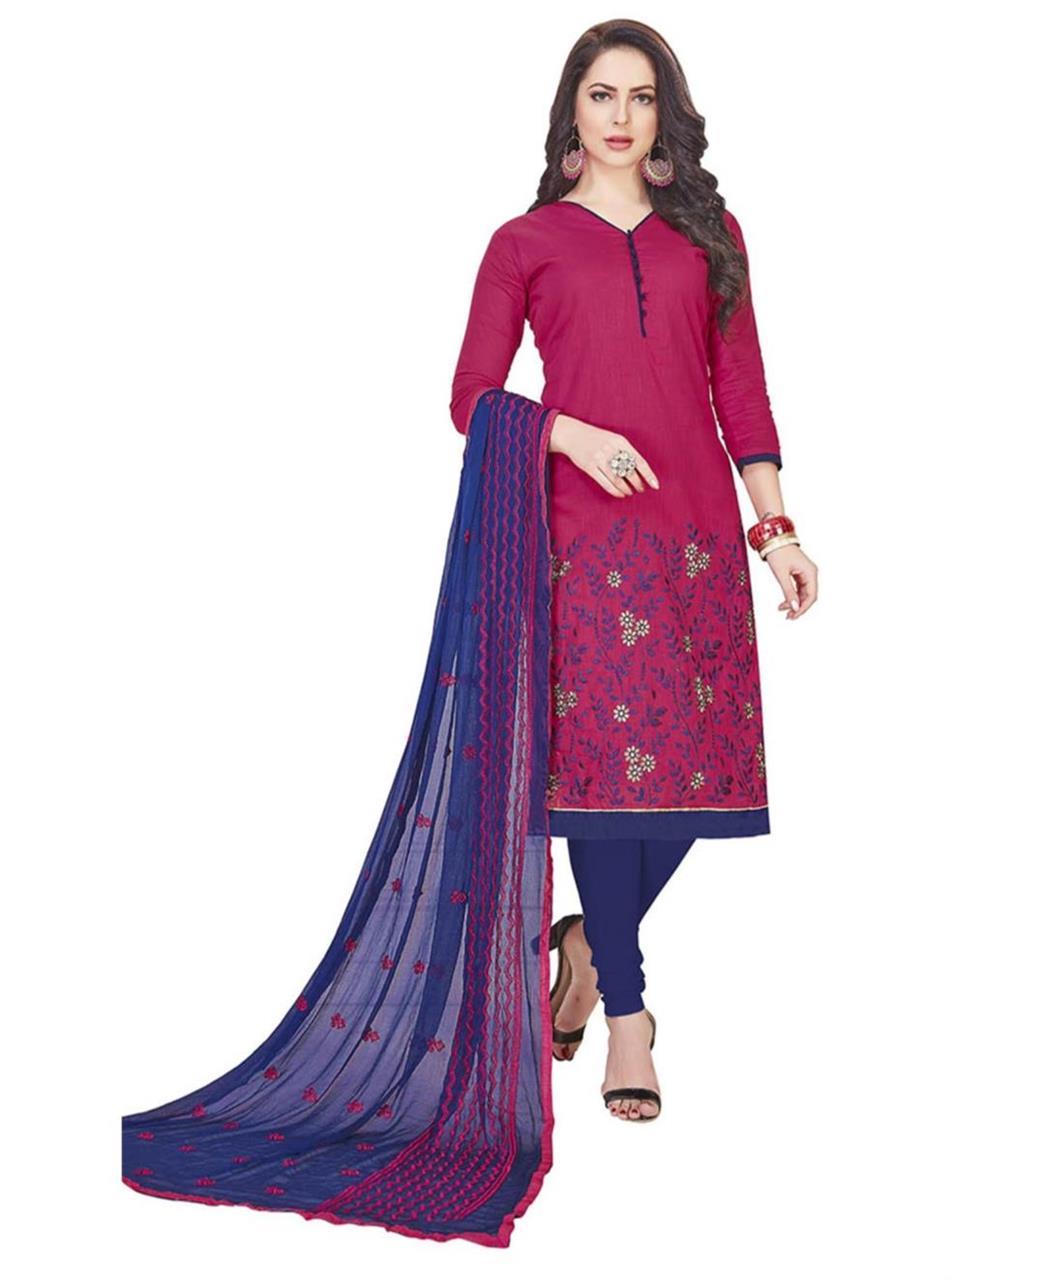 Embroidered Cotton Magenta Straight Cut Salwar